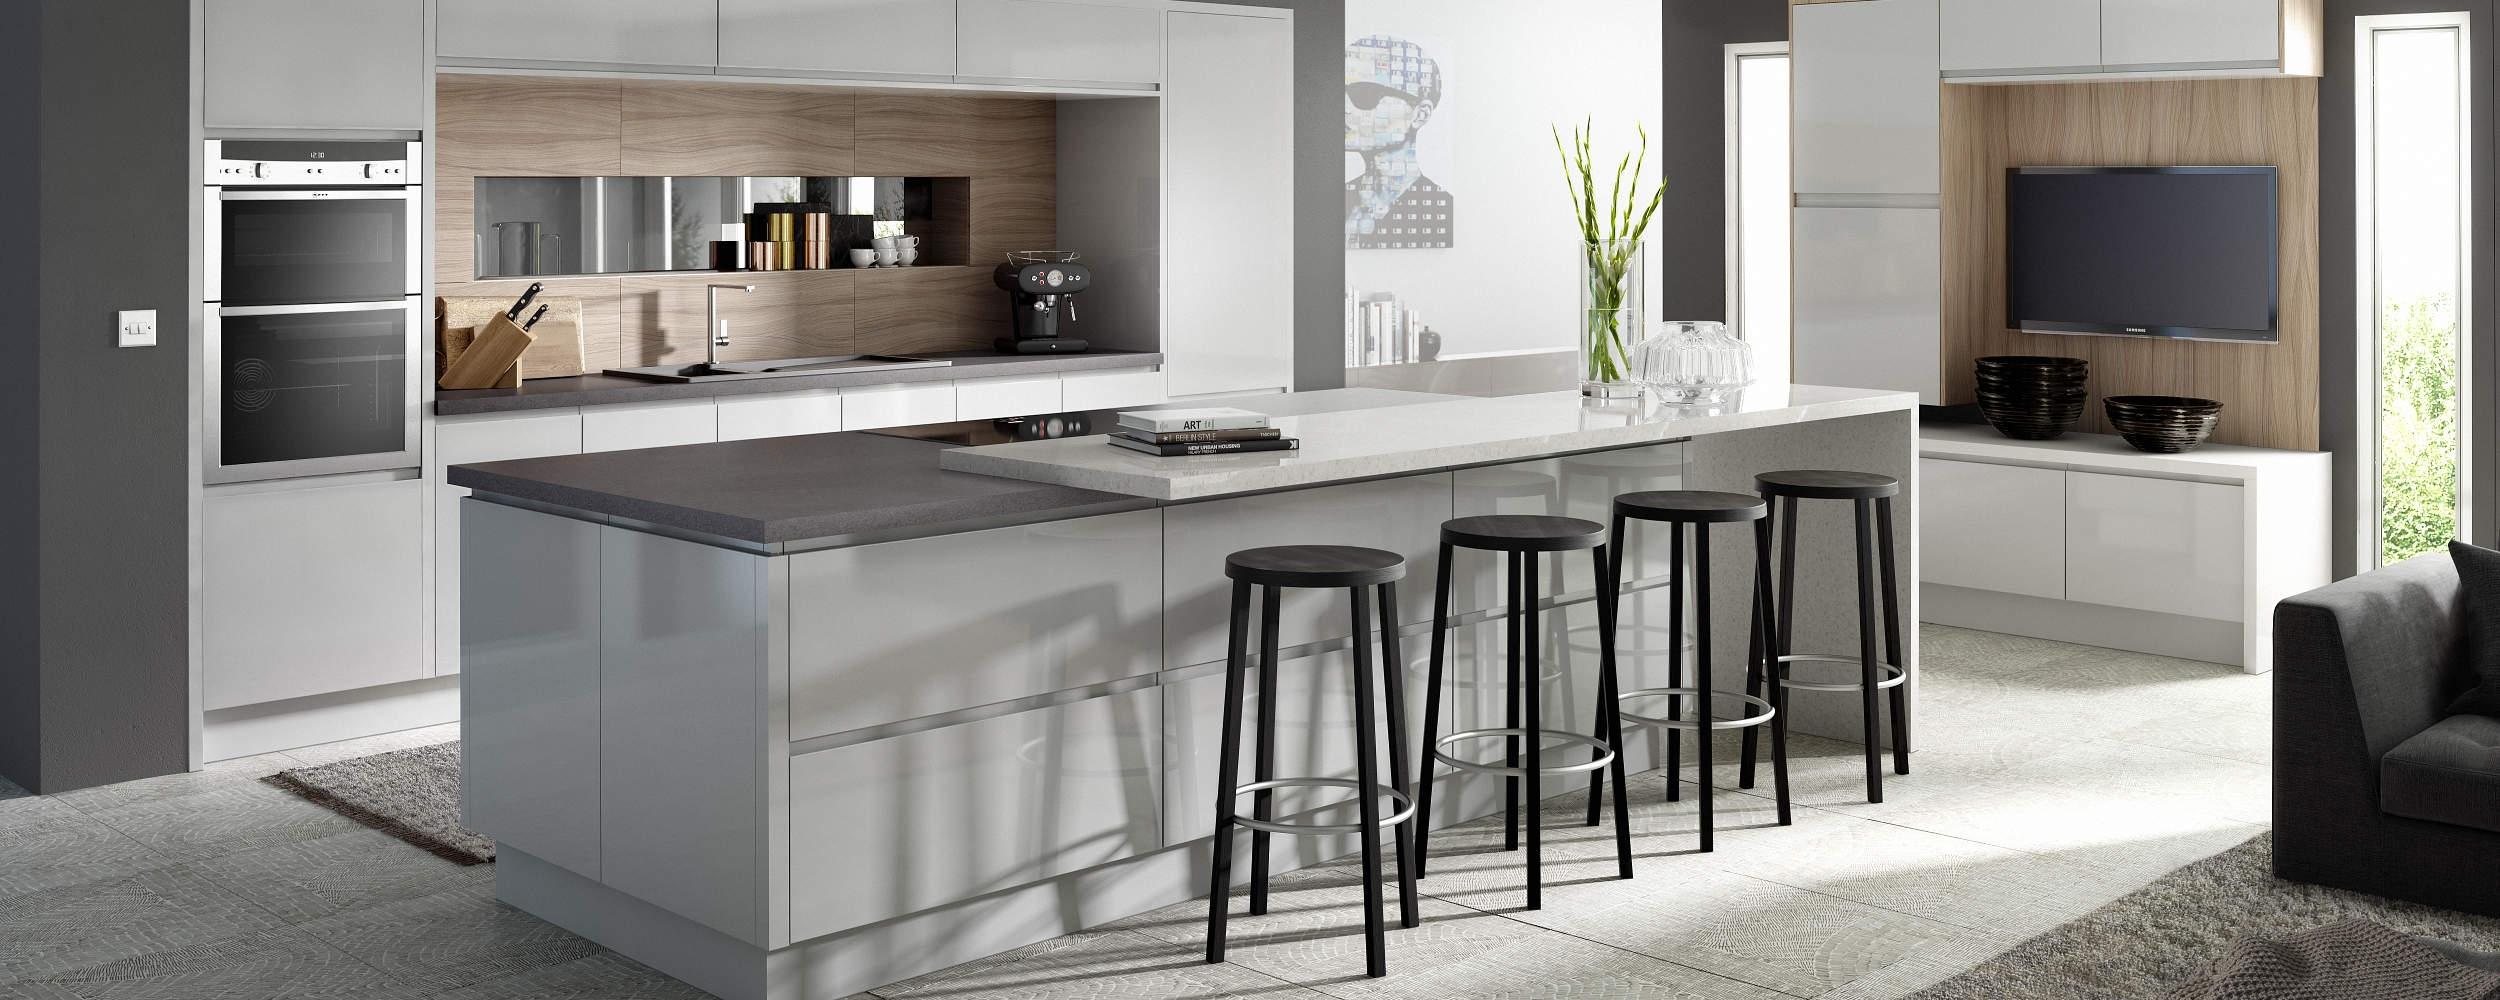 sheraton-kitchen-design